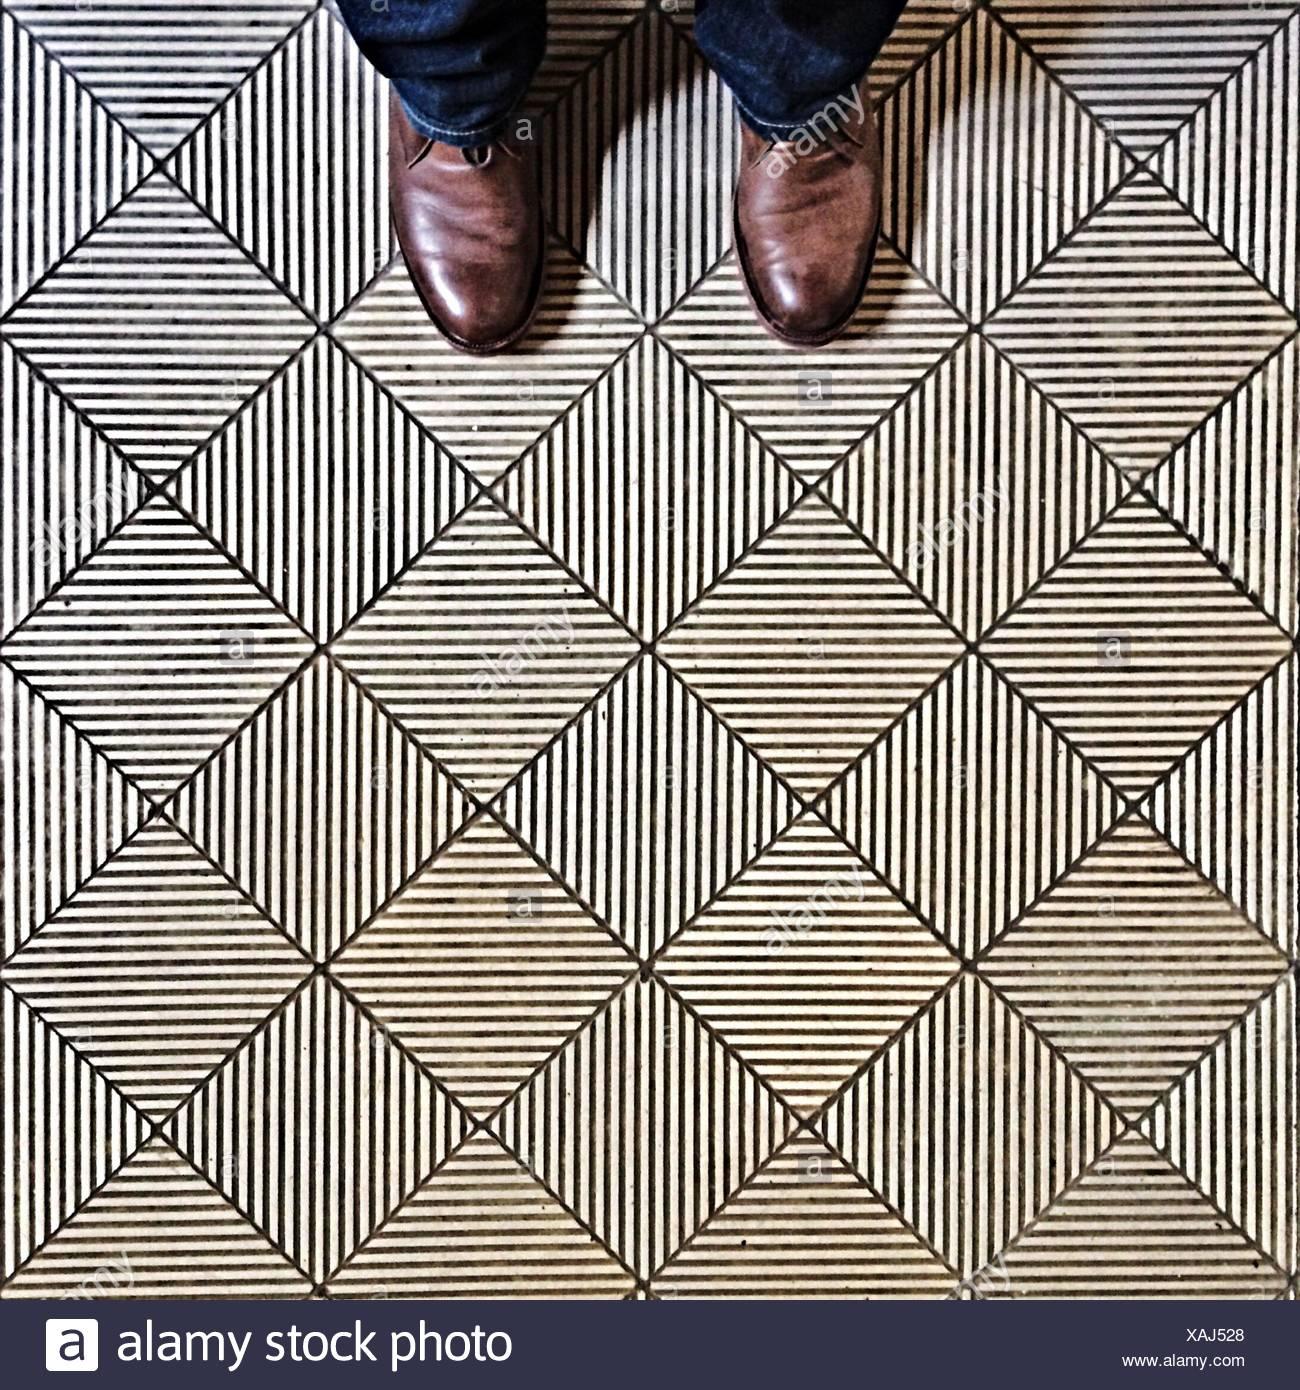 Mannes Füße am Boden Stockbild